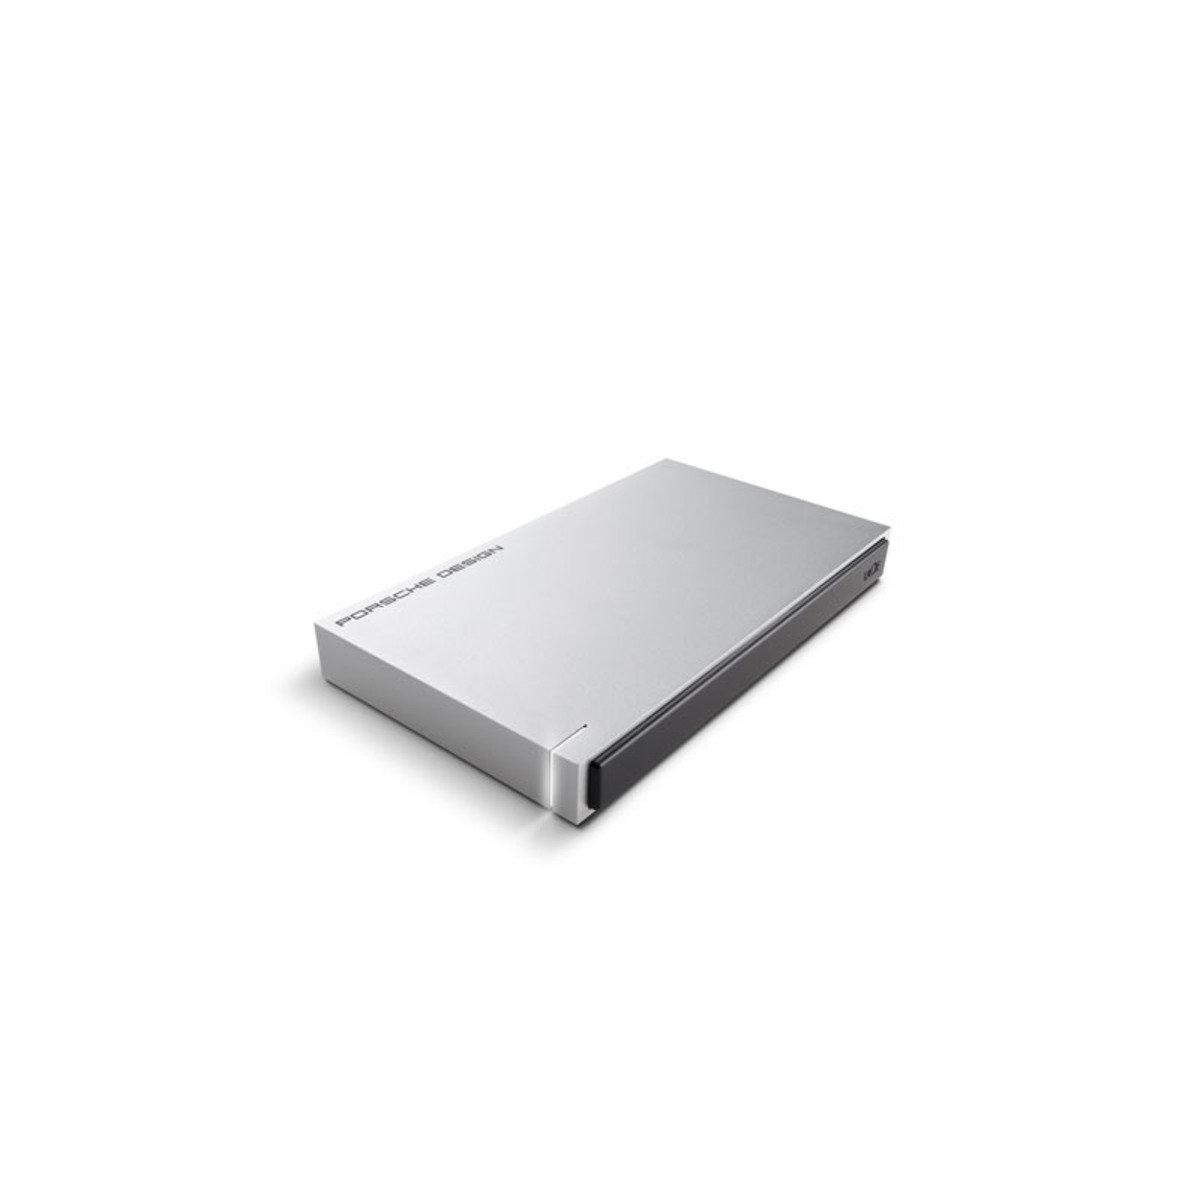 Porsche Design Mobile For Mac 1TB USB3.0 2.5吋 外置硬碟 9000293